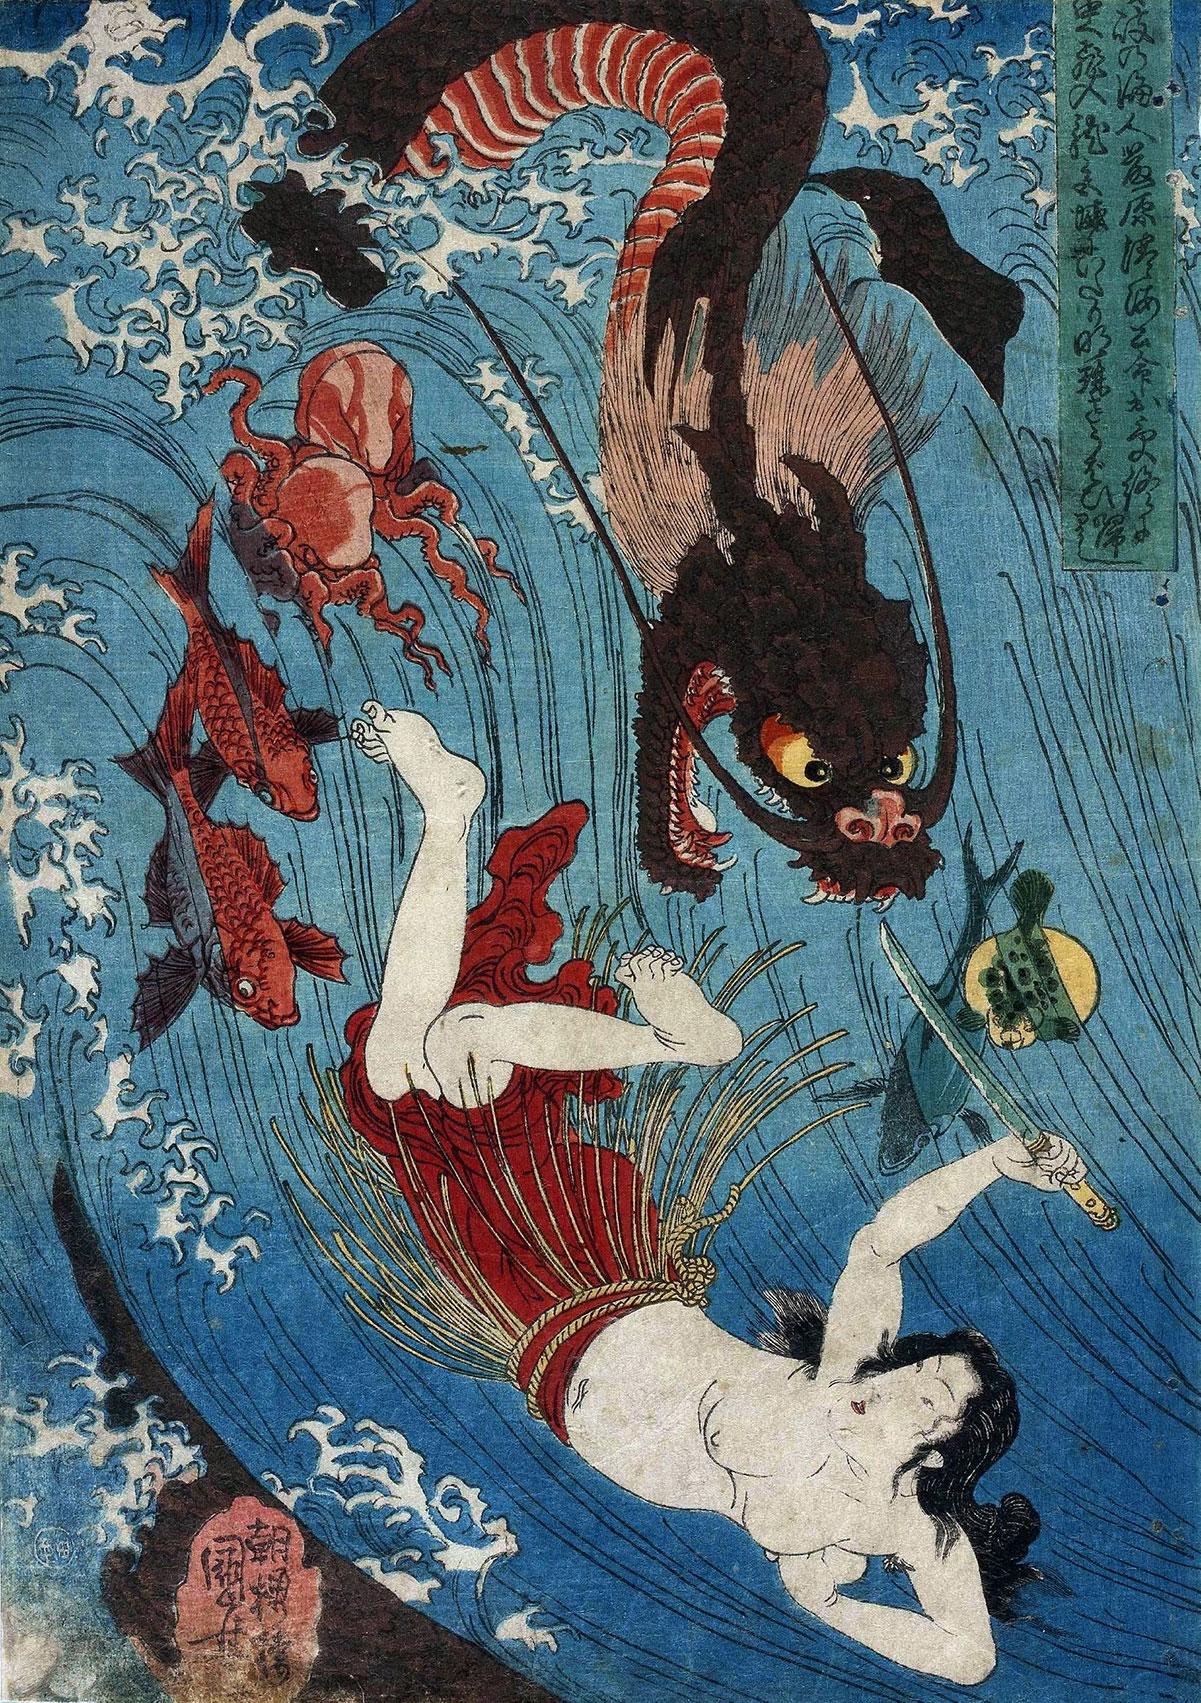 Prinzessin Tamatori holt das Juwel von Amaterasu vom Drachengott zurück. (Foto: Utagawa Kuniyoshi auf Wikimedia Commons https://commons.wikimedia.org/wiki/File:Utagawa_Kuniyoshi_Tamatori_escaping_from_the_Dragon_King.jpg CC0 1.0)